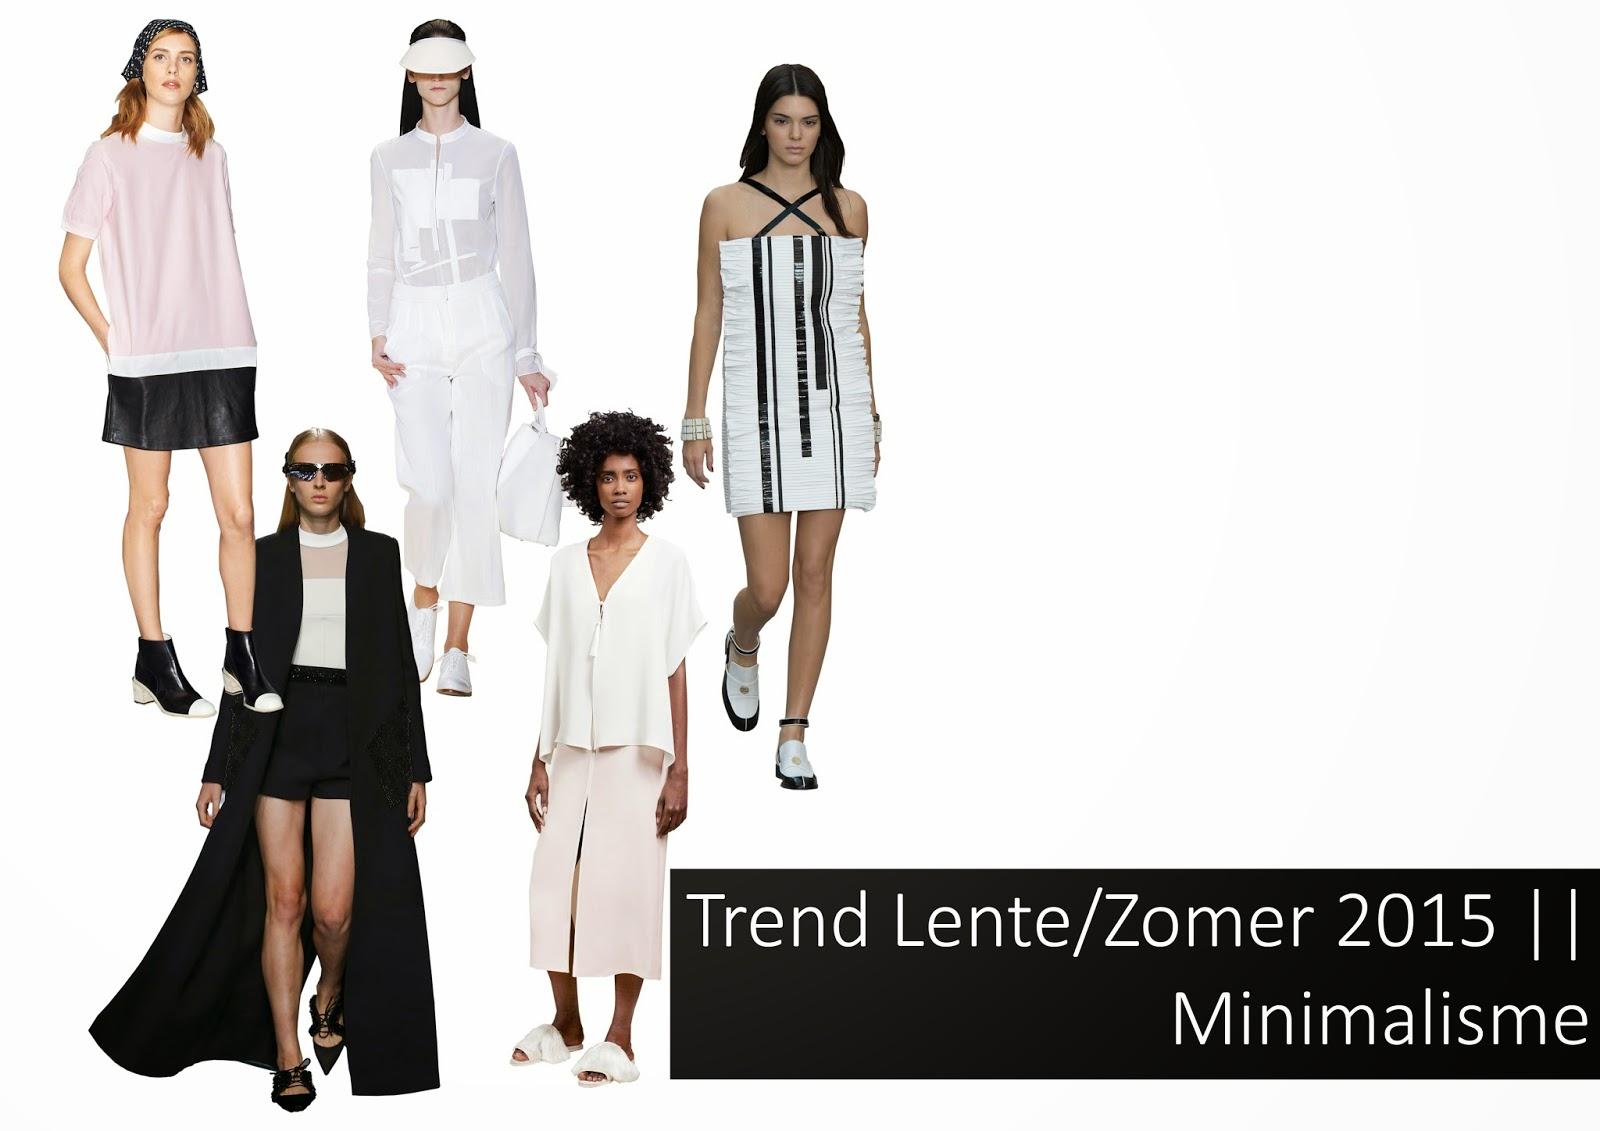 Tassen Trends Lente Zomer 2015 : The invisible creations trend lente zomer minimalisme